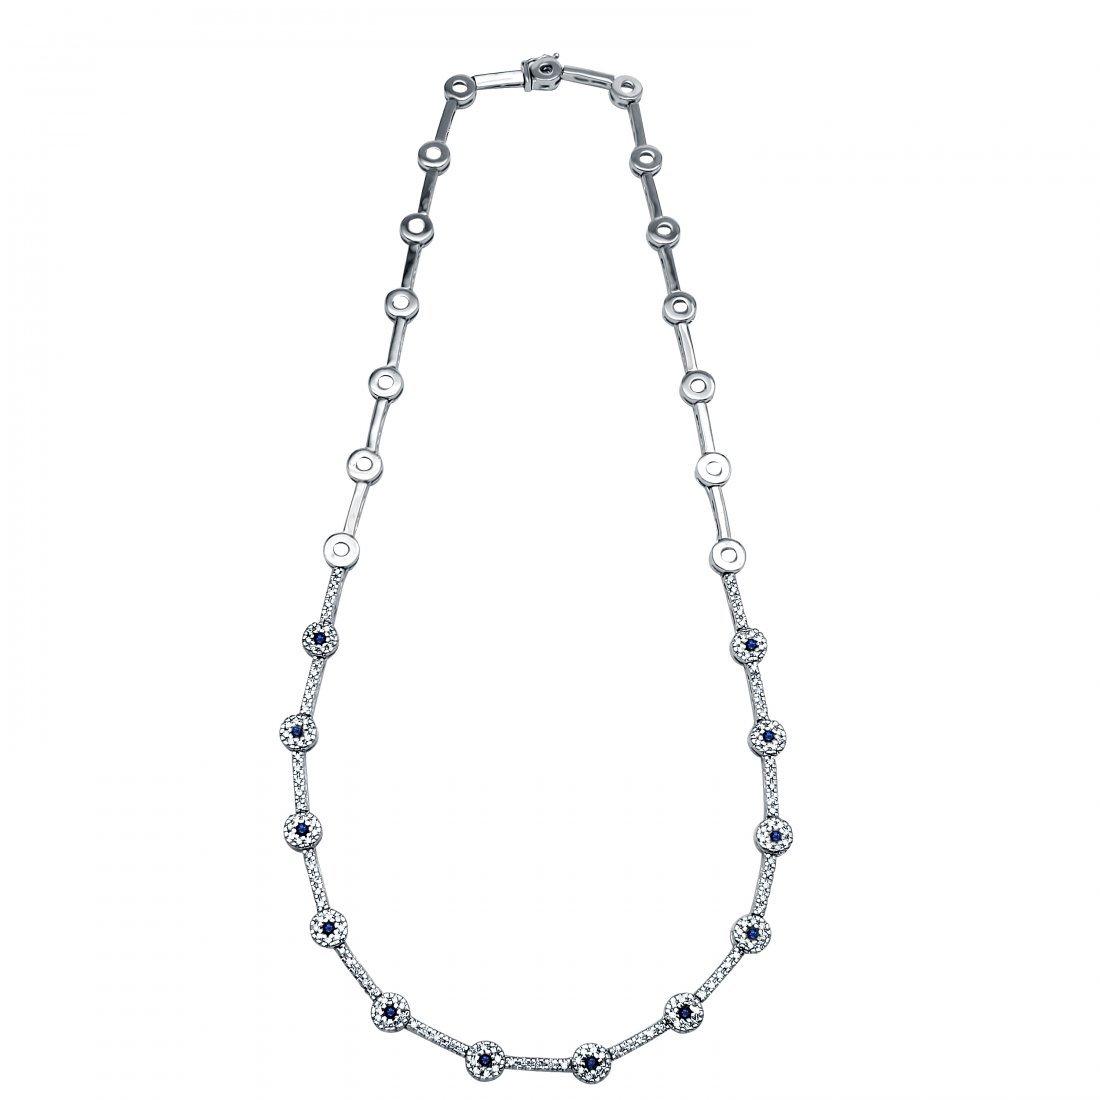 1.83 CTW 18K White Gold Ladies Necklace